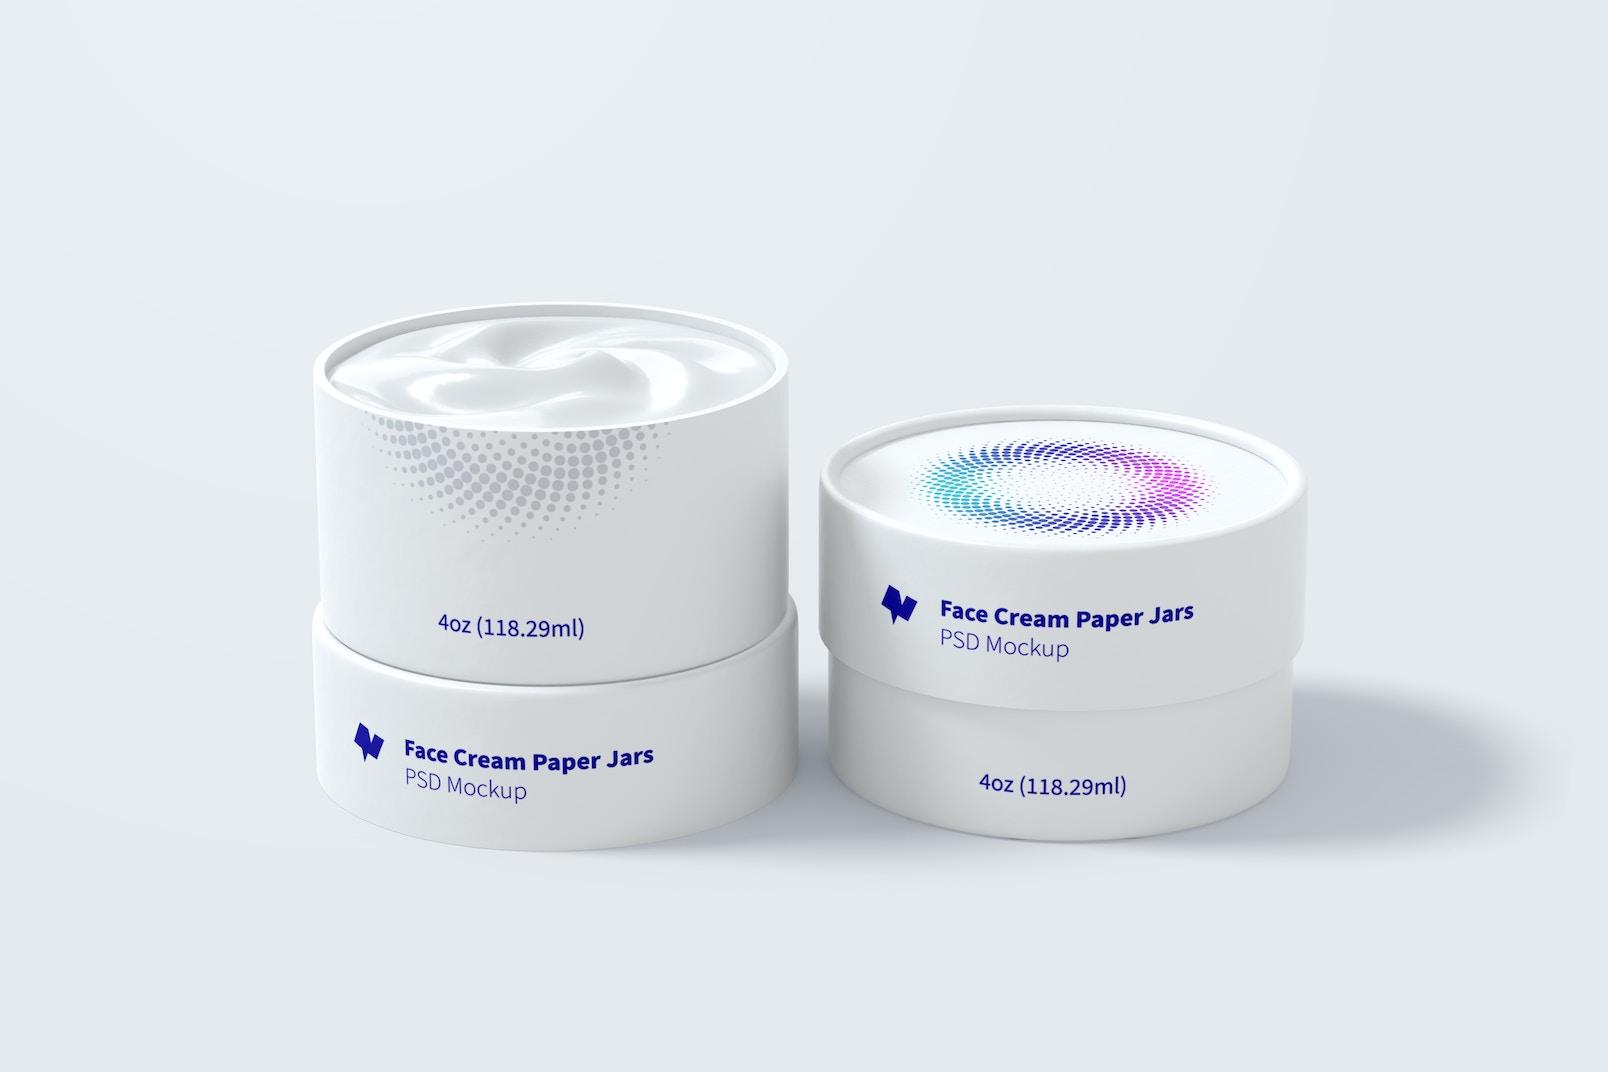 4oz Face Cream Paper Jars Mockup